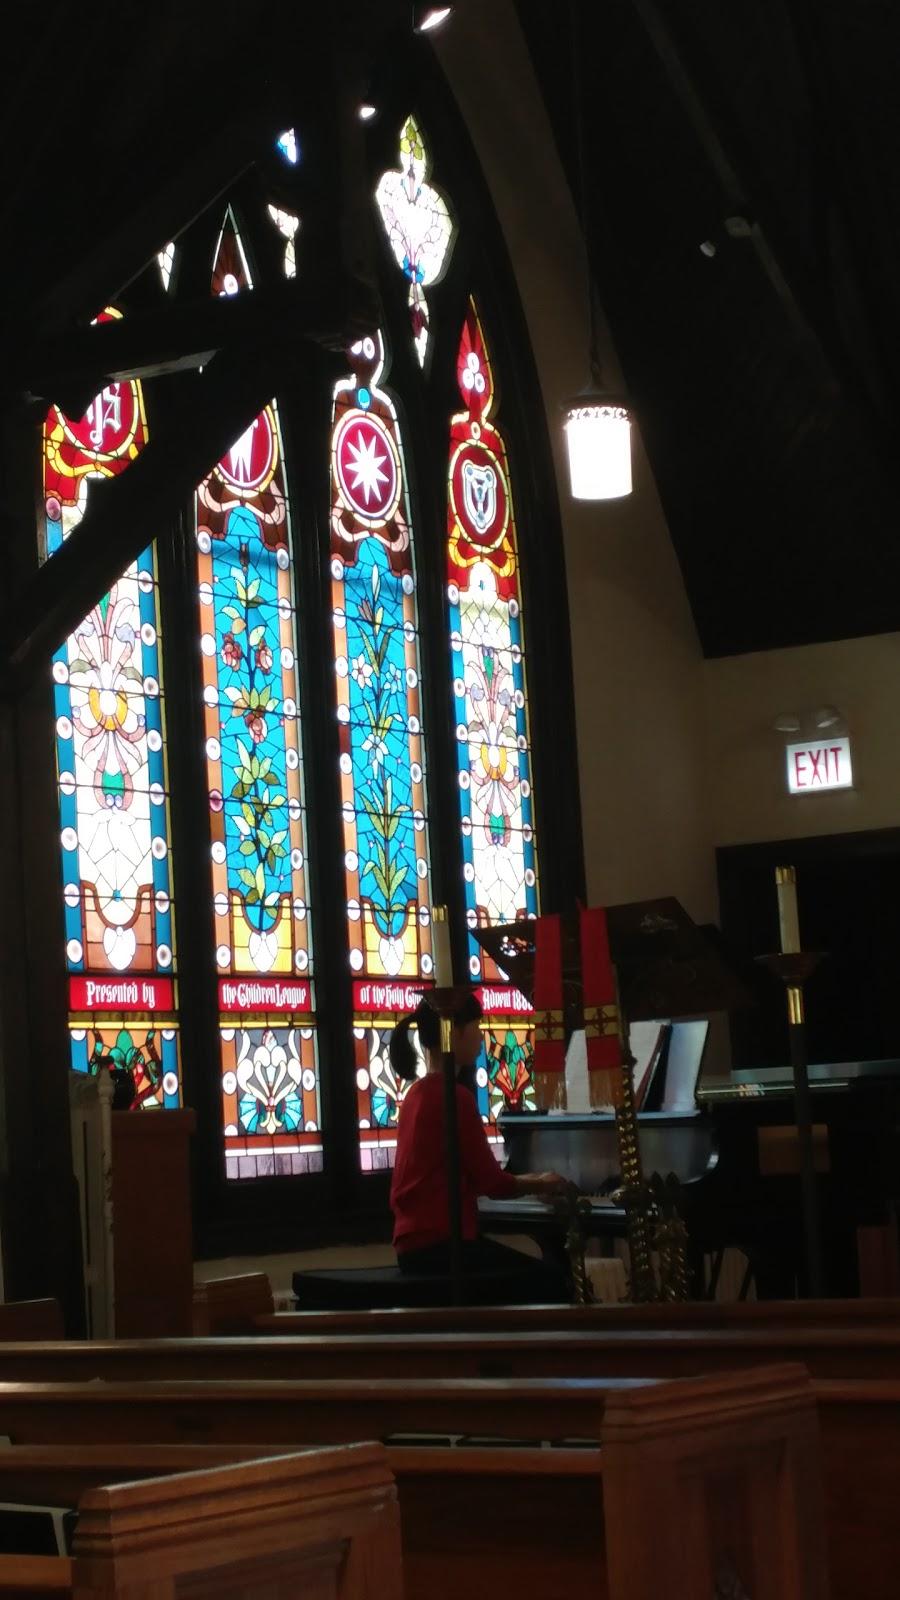 St Johns Episcopal Church - church    Photo 7 of 10   Address: 3857 N Kostner Ave, Chicago, IL 60641, USA   Phone: (773) 725-9026